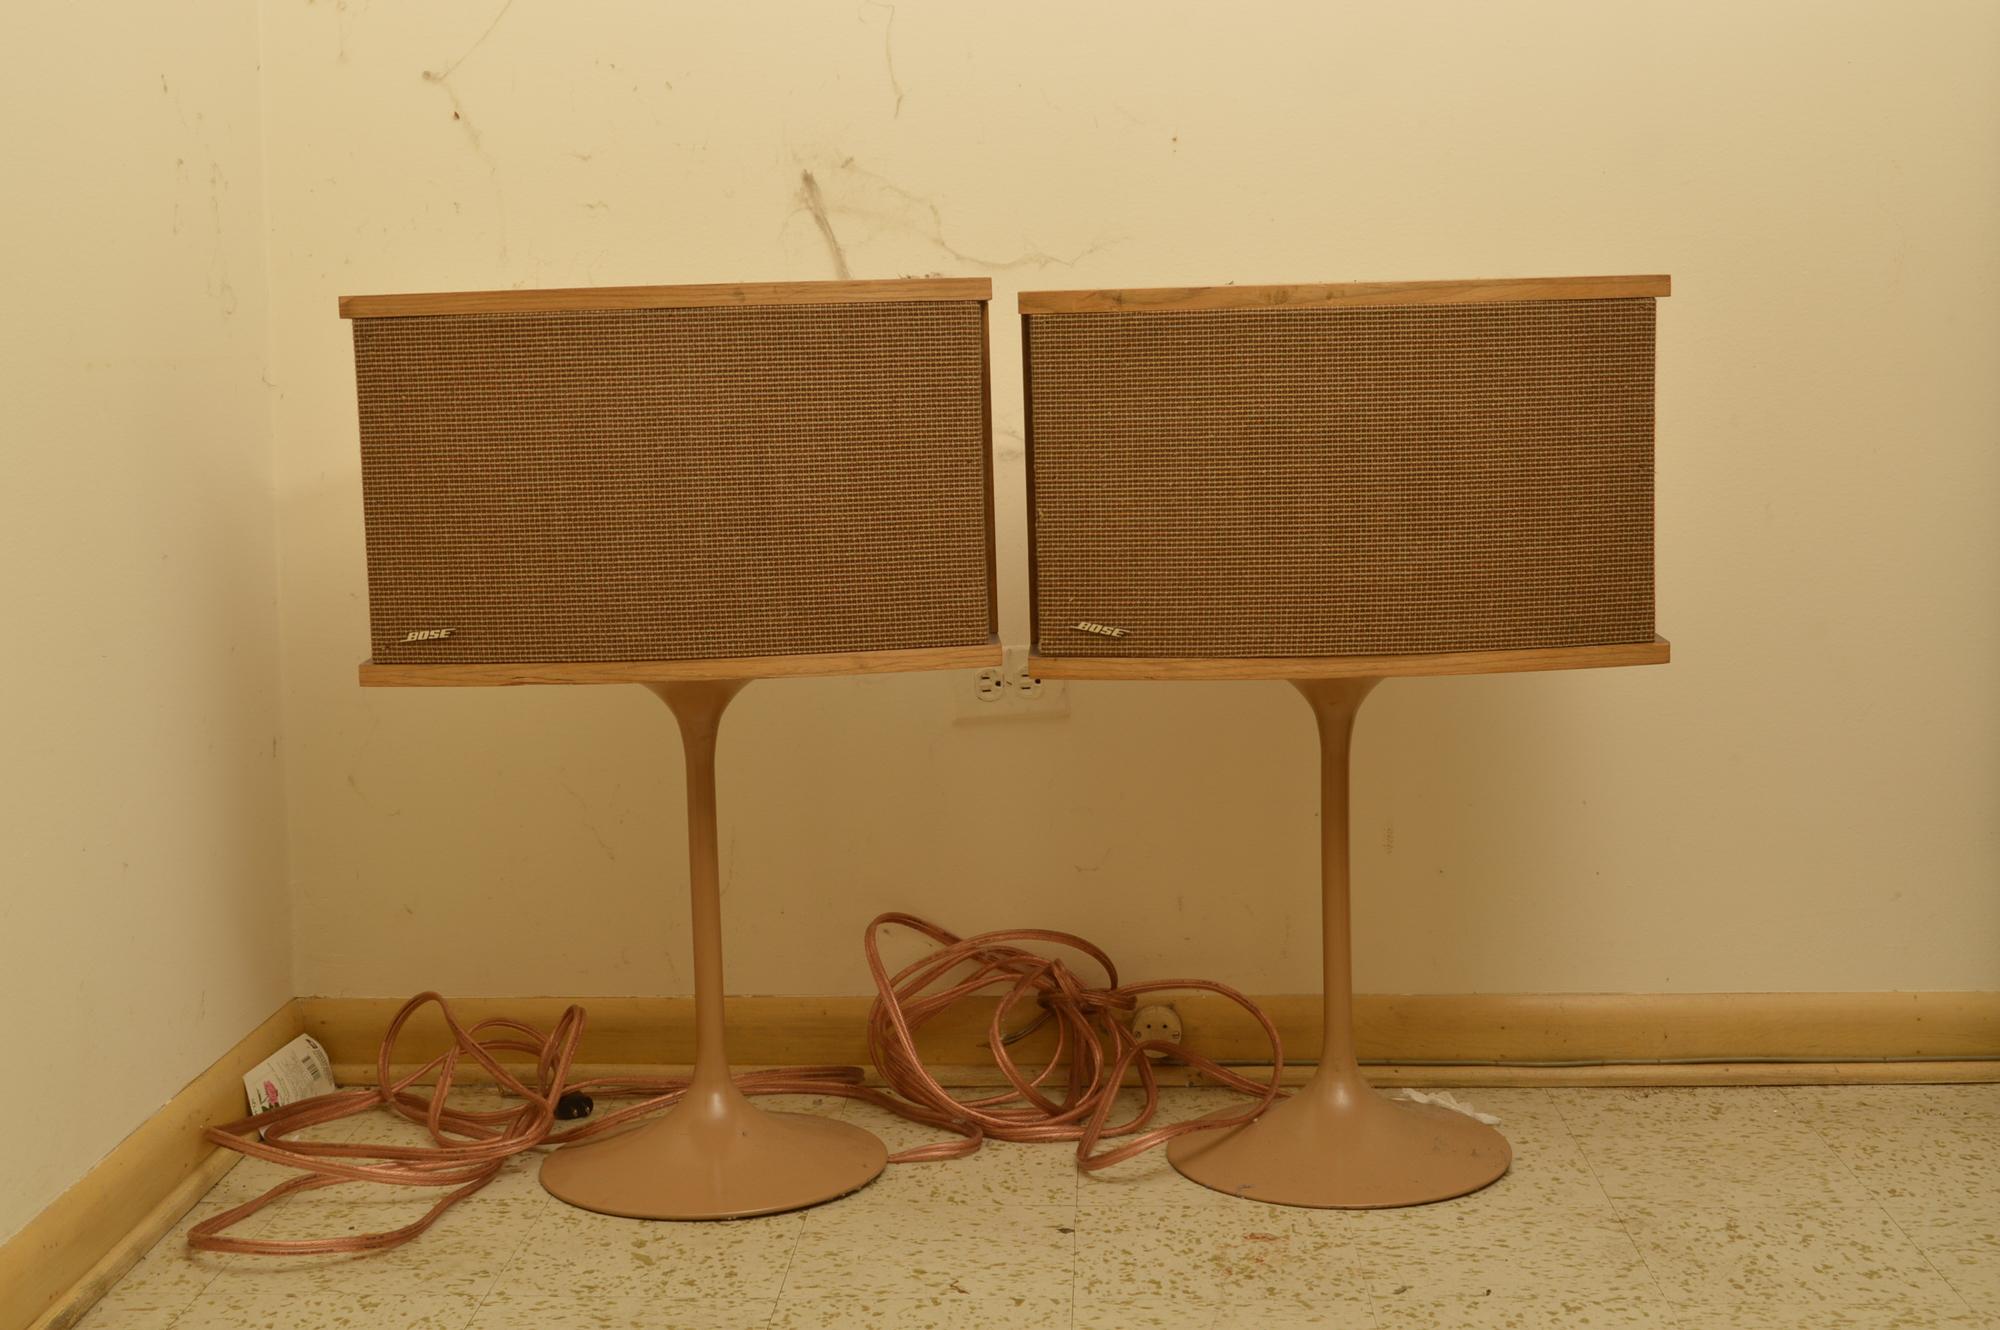 vintage bose speakers. vintage bose speakers on tulip stands